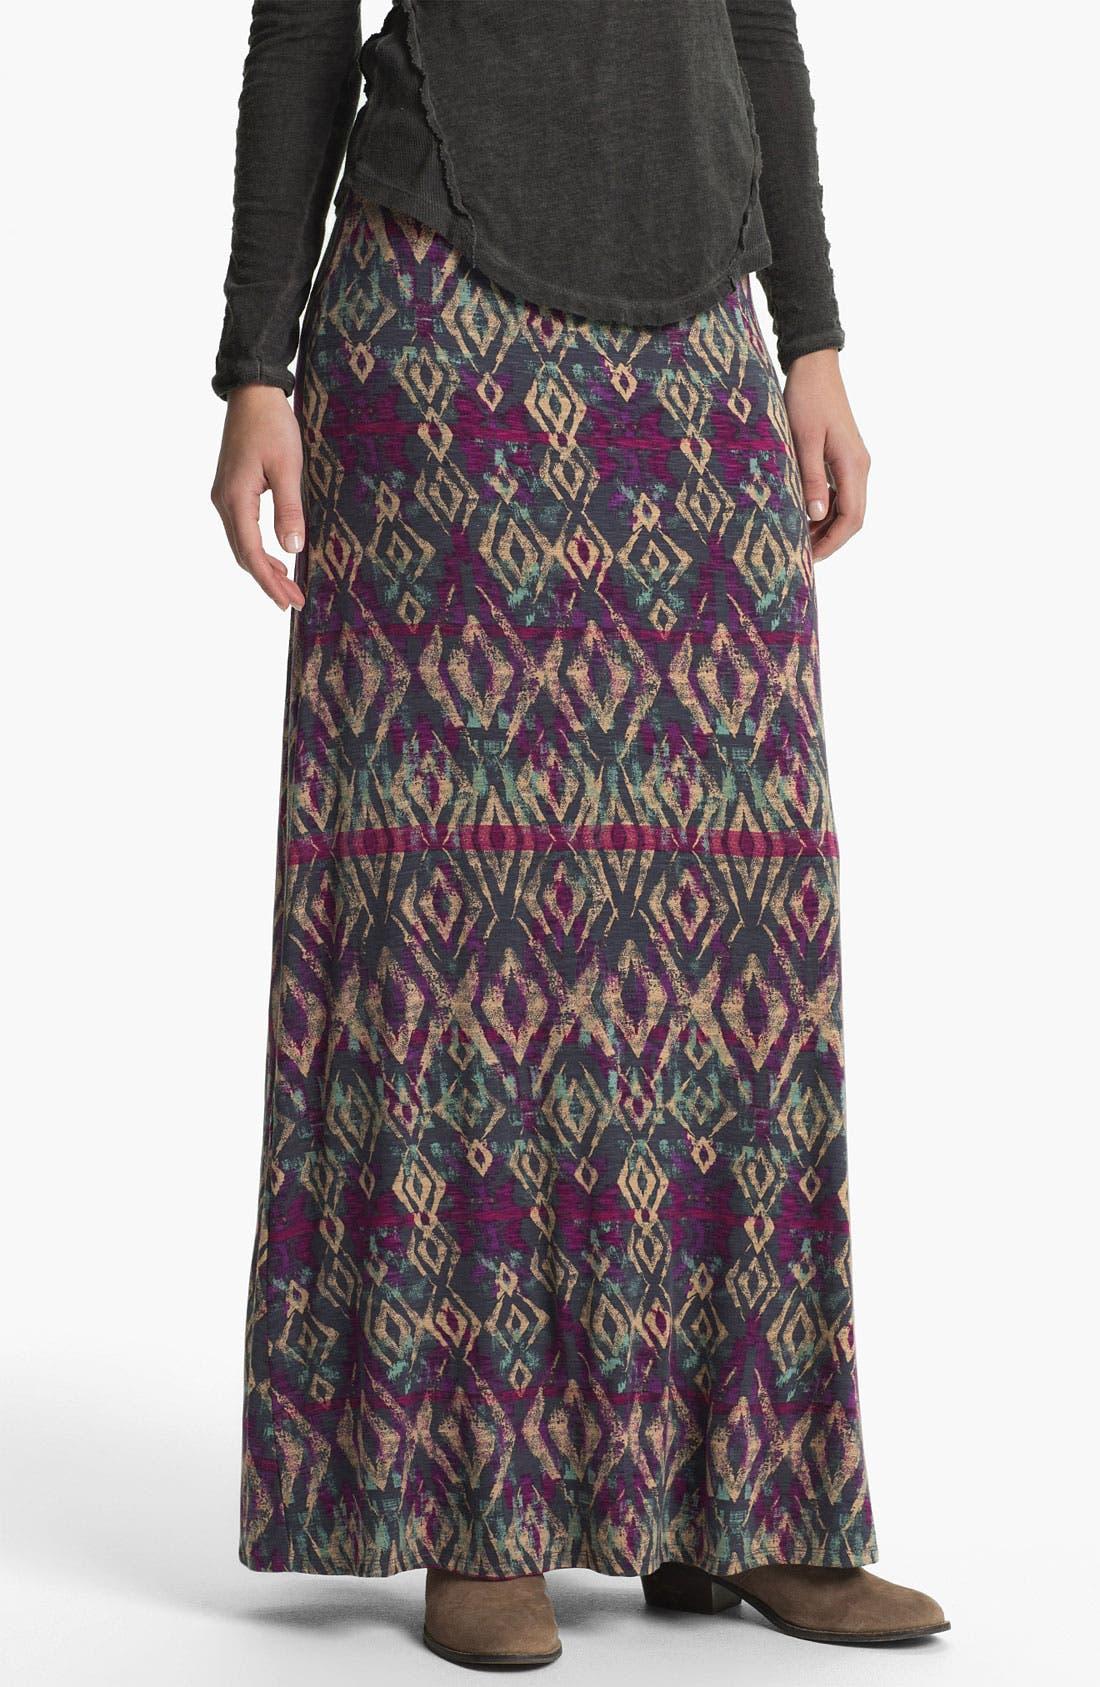 Alternate Image 1 Selected - Free People 'Sahaying' Print Maxi Skirt